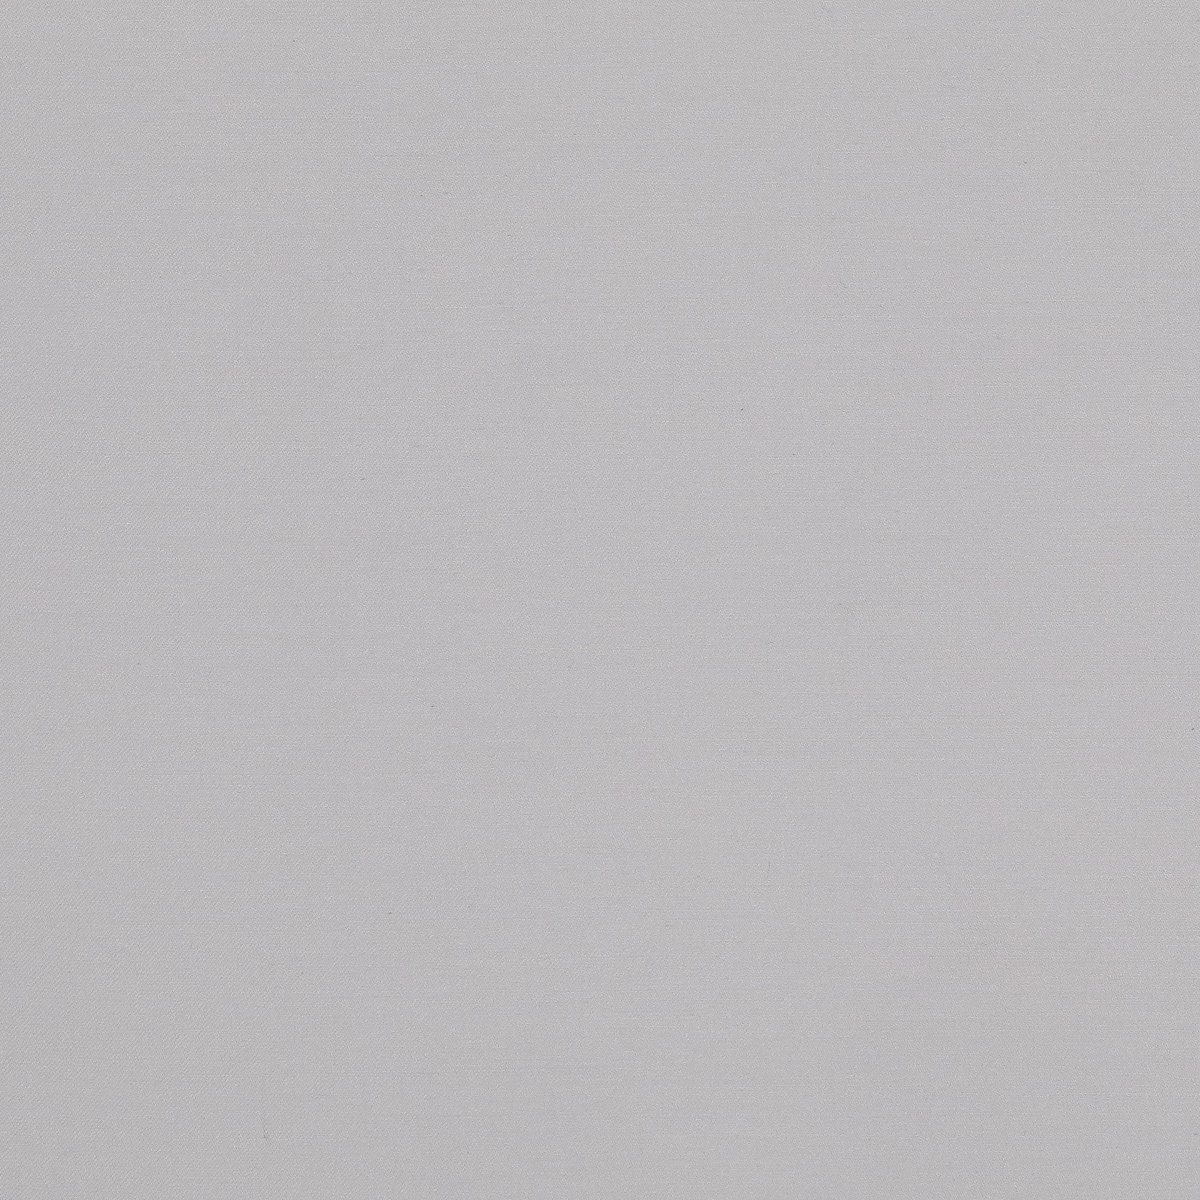 Нежно-лавандовая хлопково-шёлковая саржа